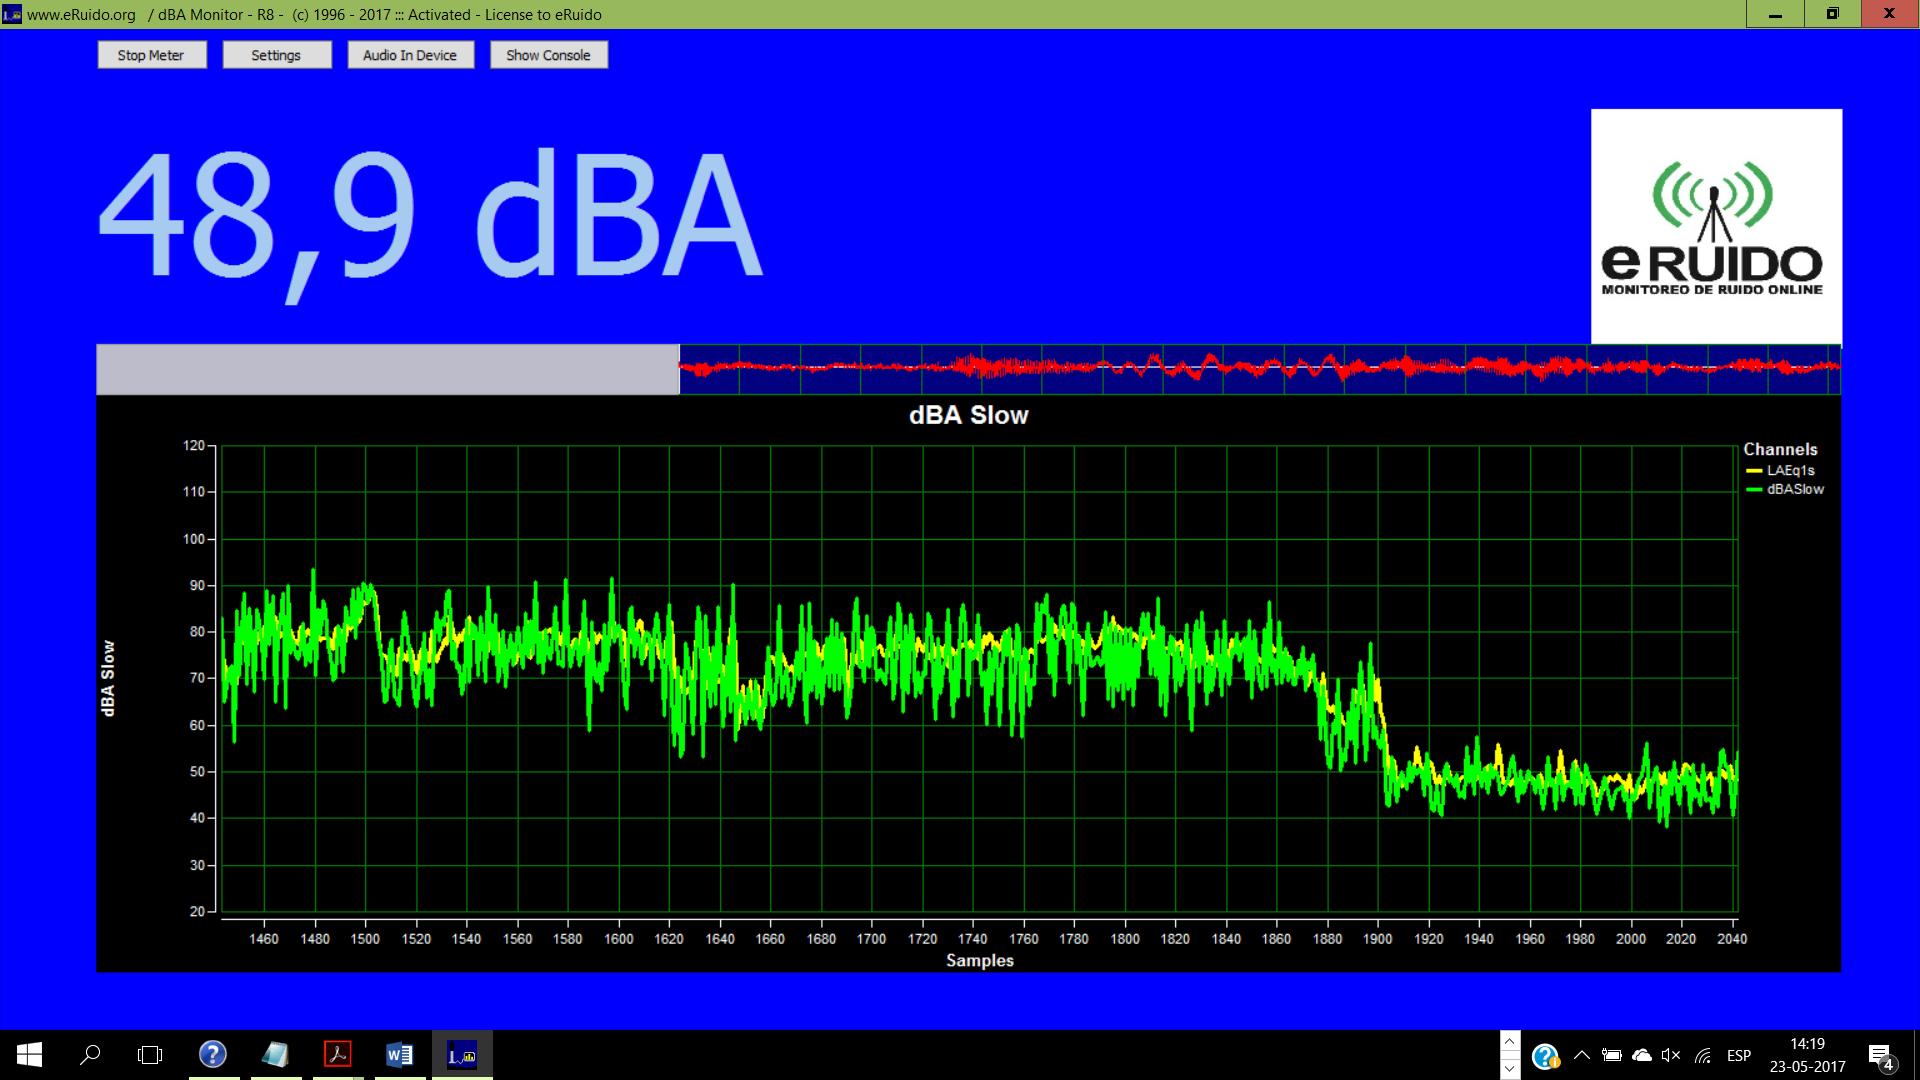 dBAMonitor R9 Sound Level Meter Software